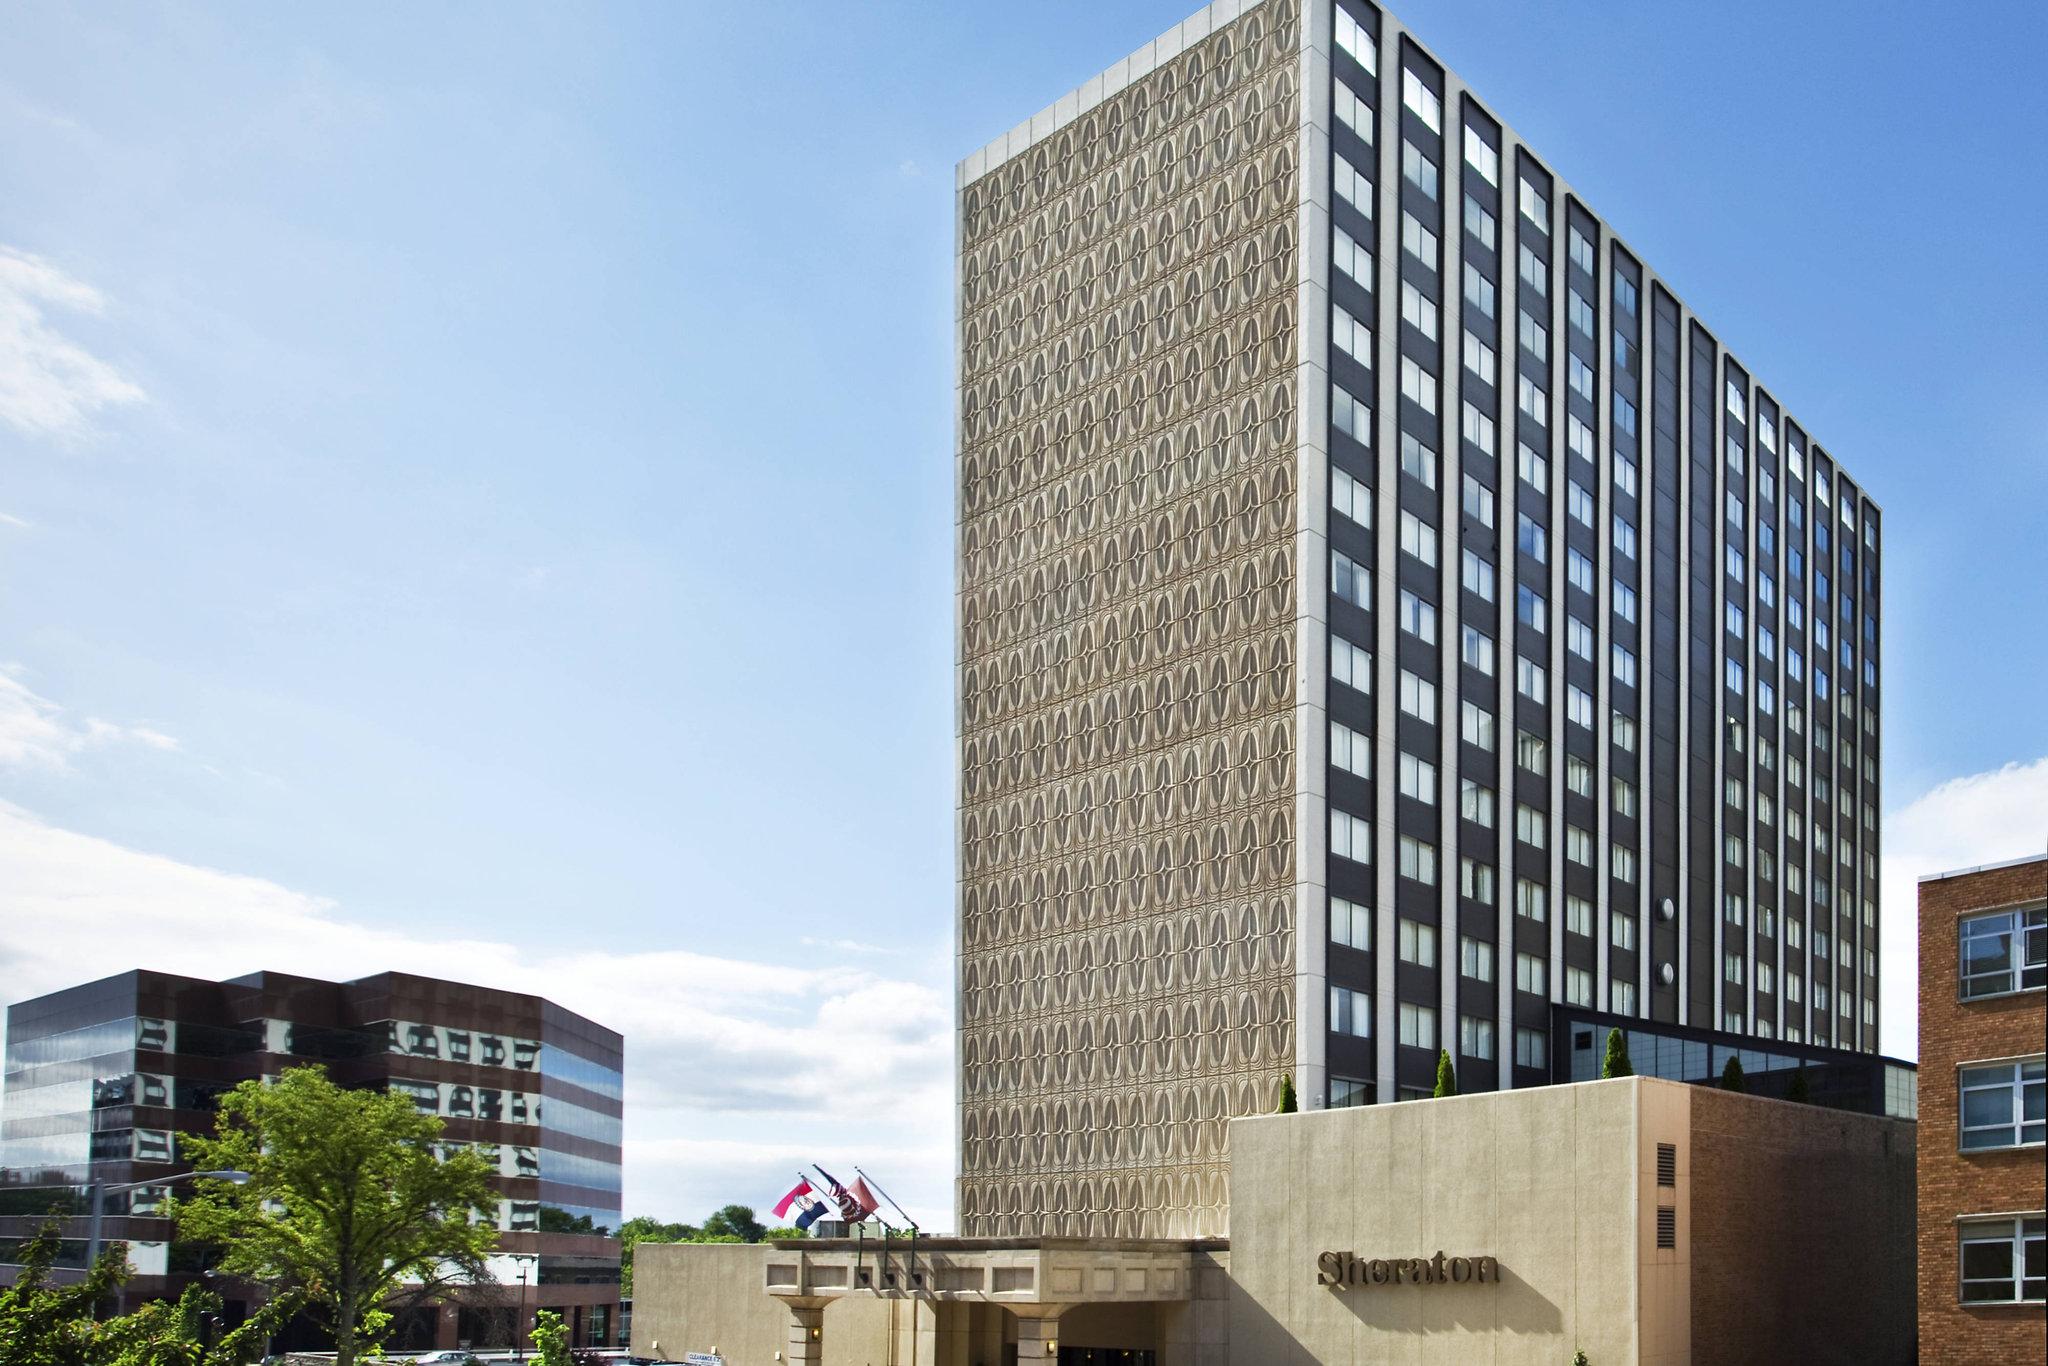 Sheraton Clayton Plaza Hotel St Louis